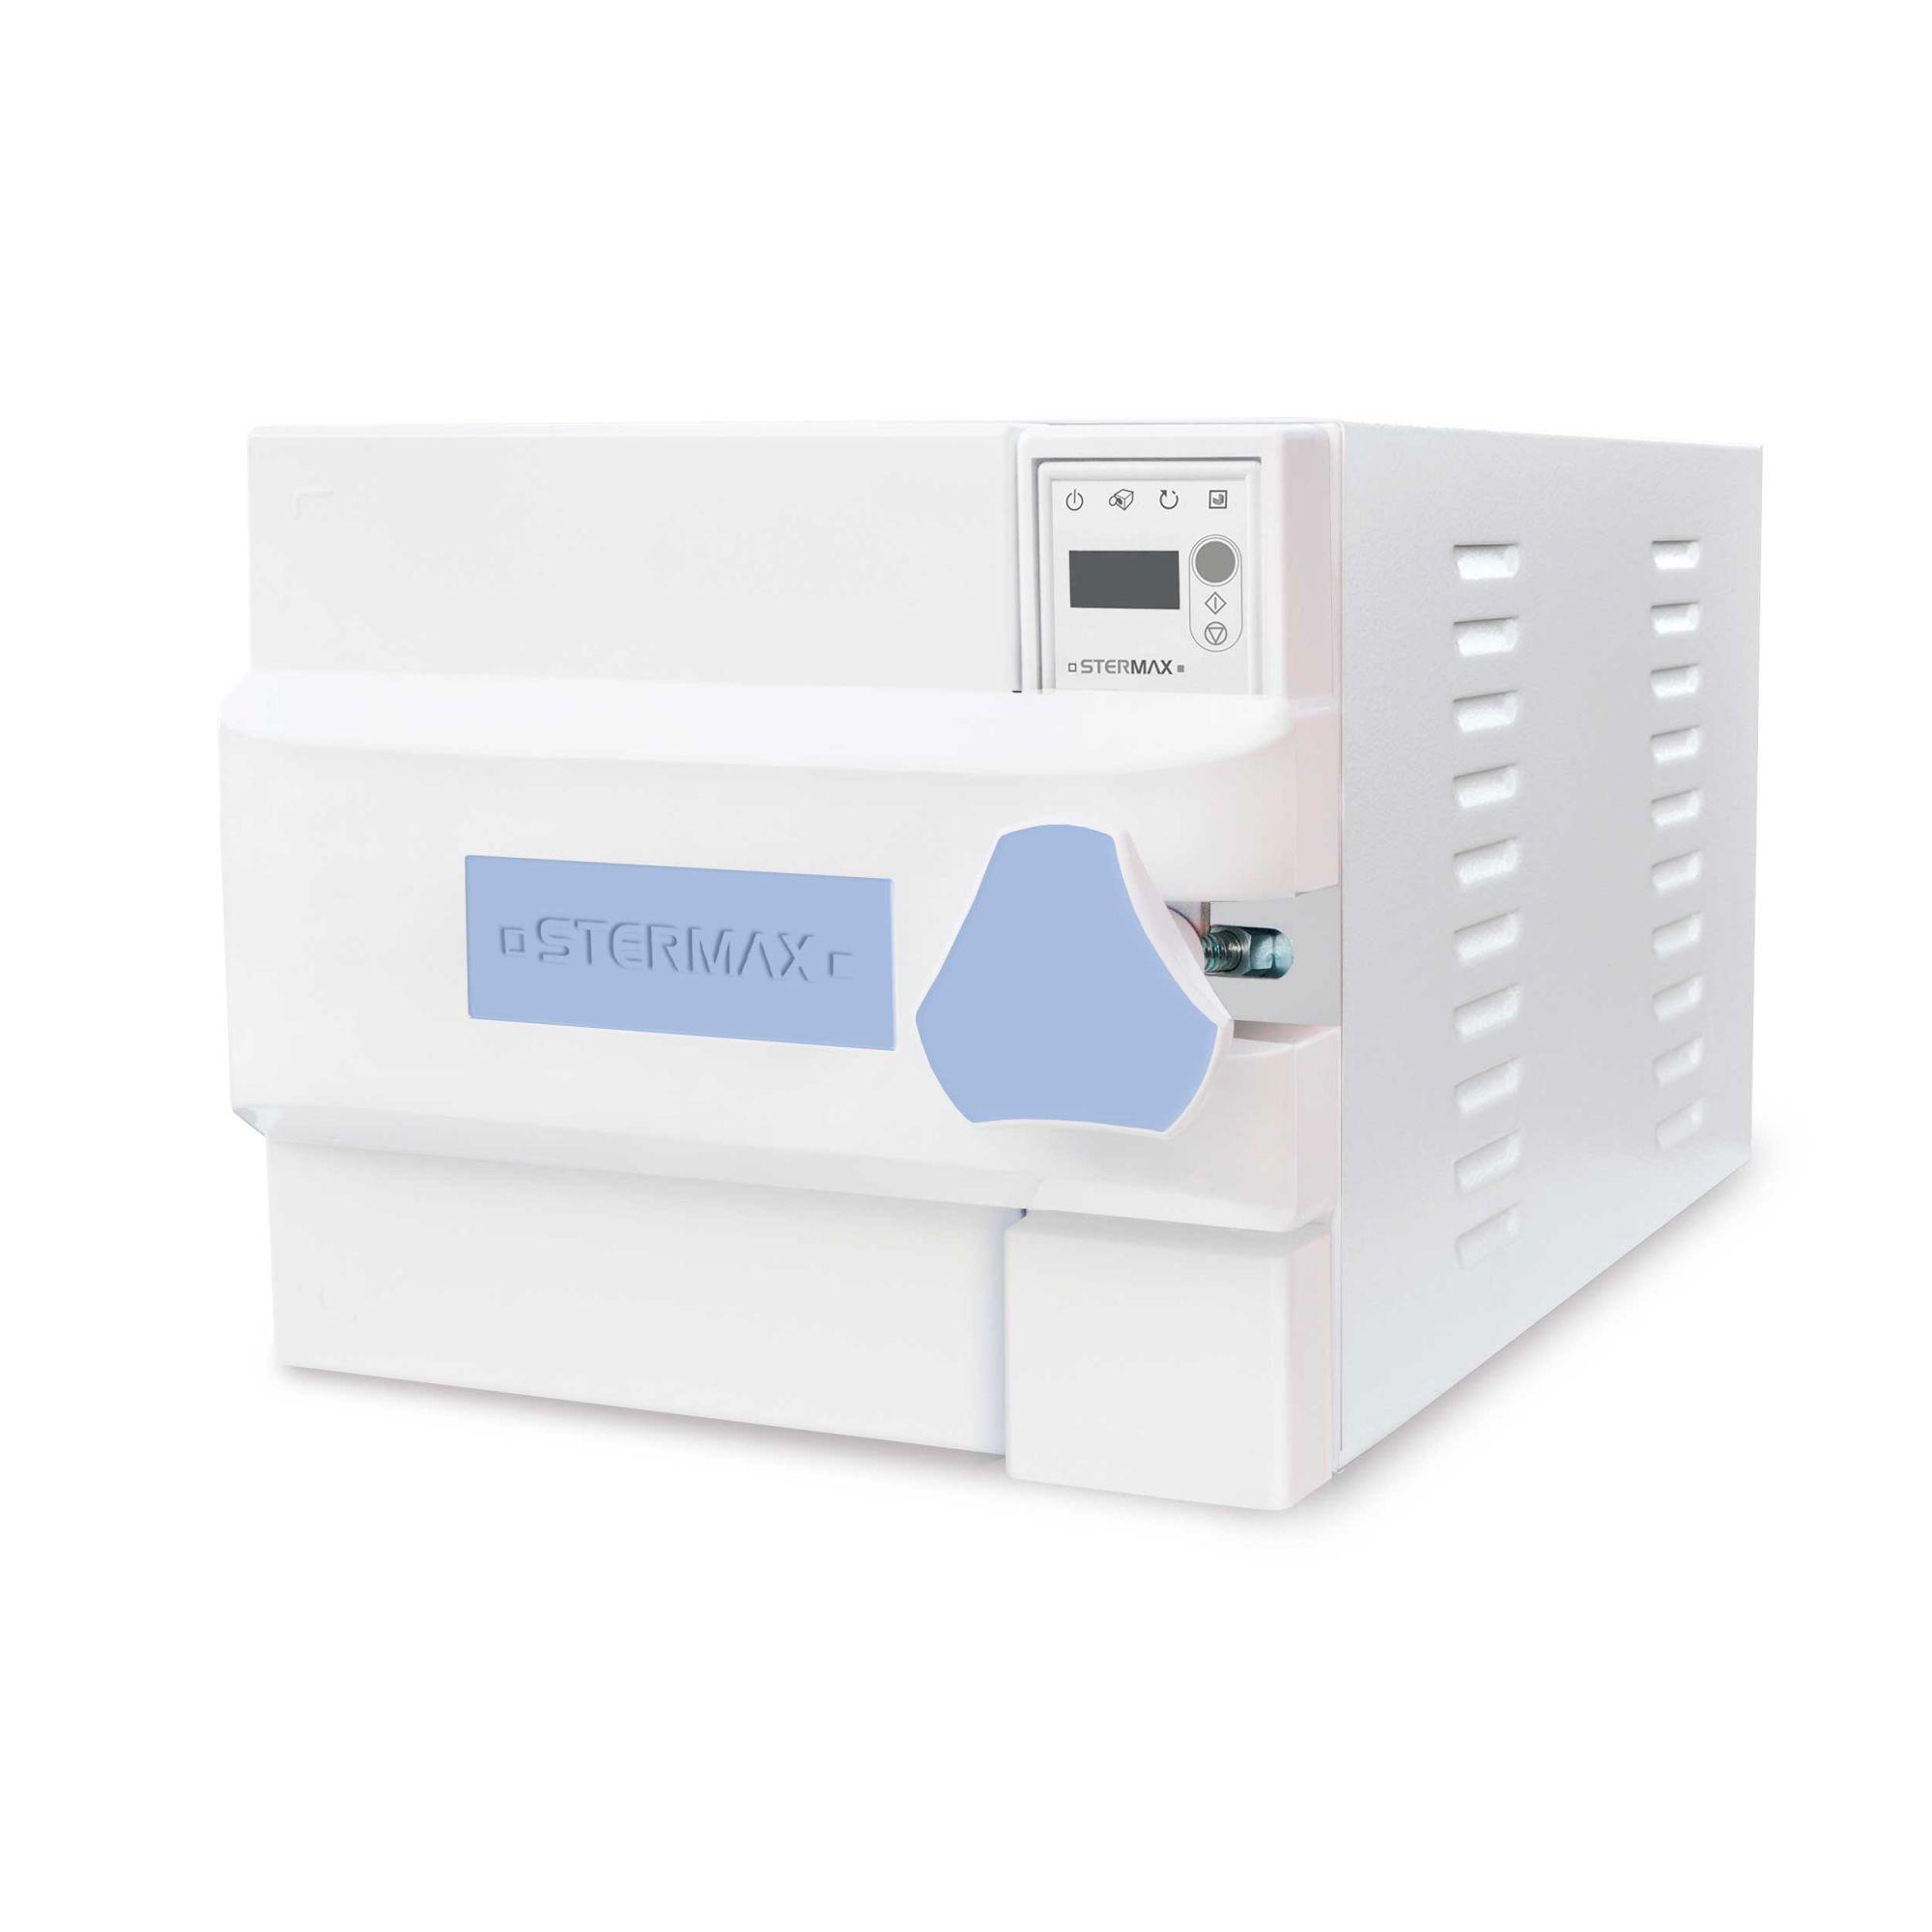 Autoclave Digital Flex 21 Litros -Stermax